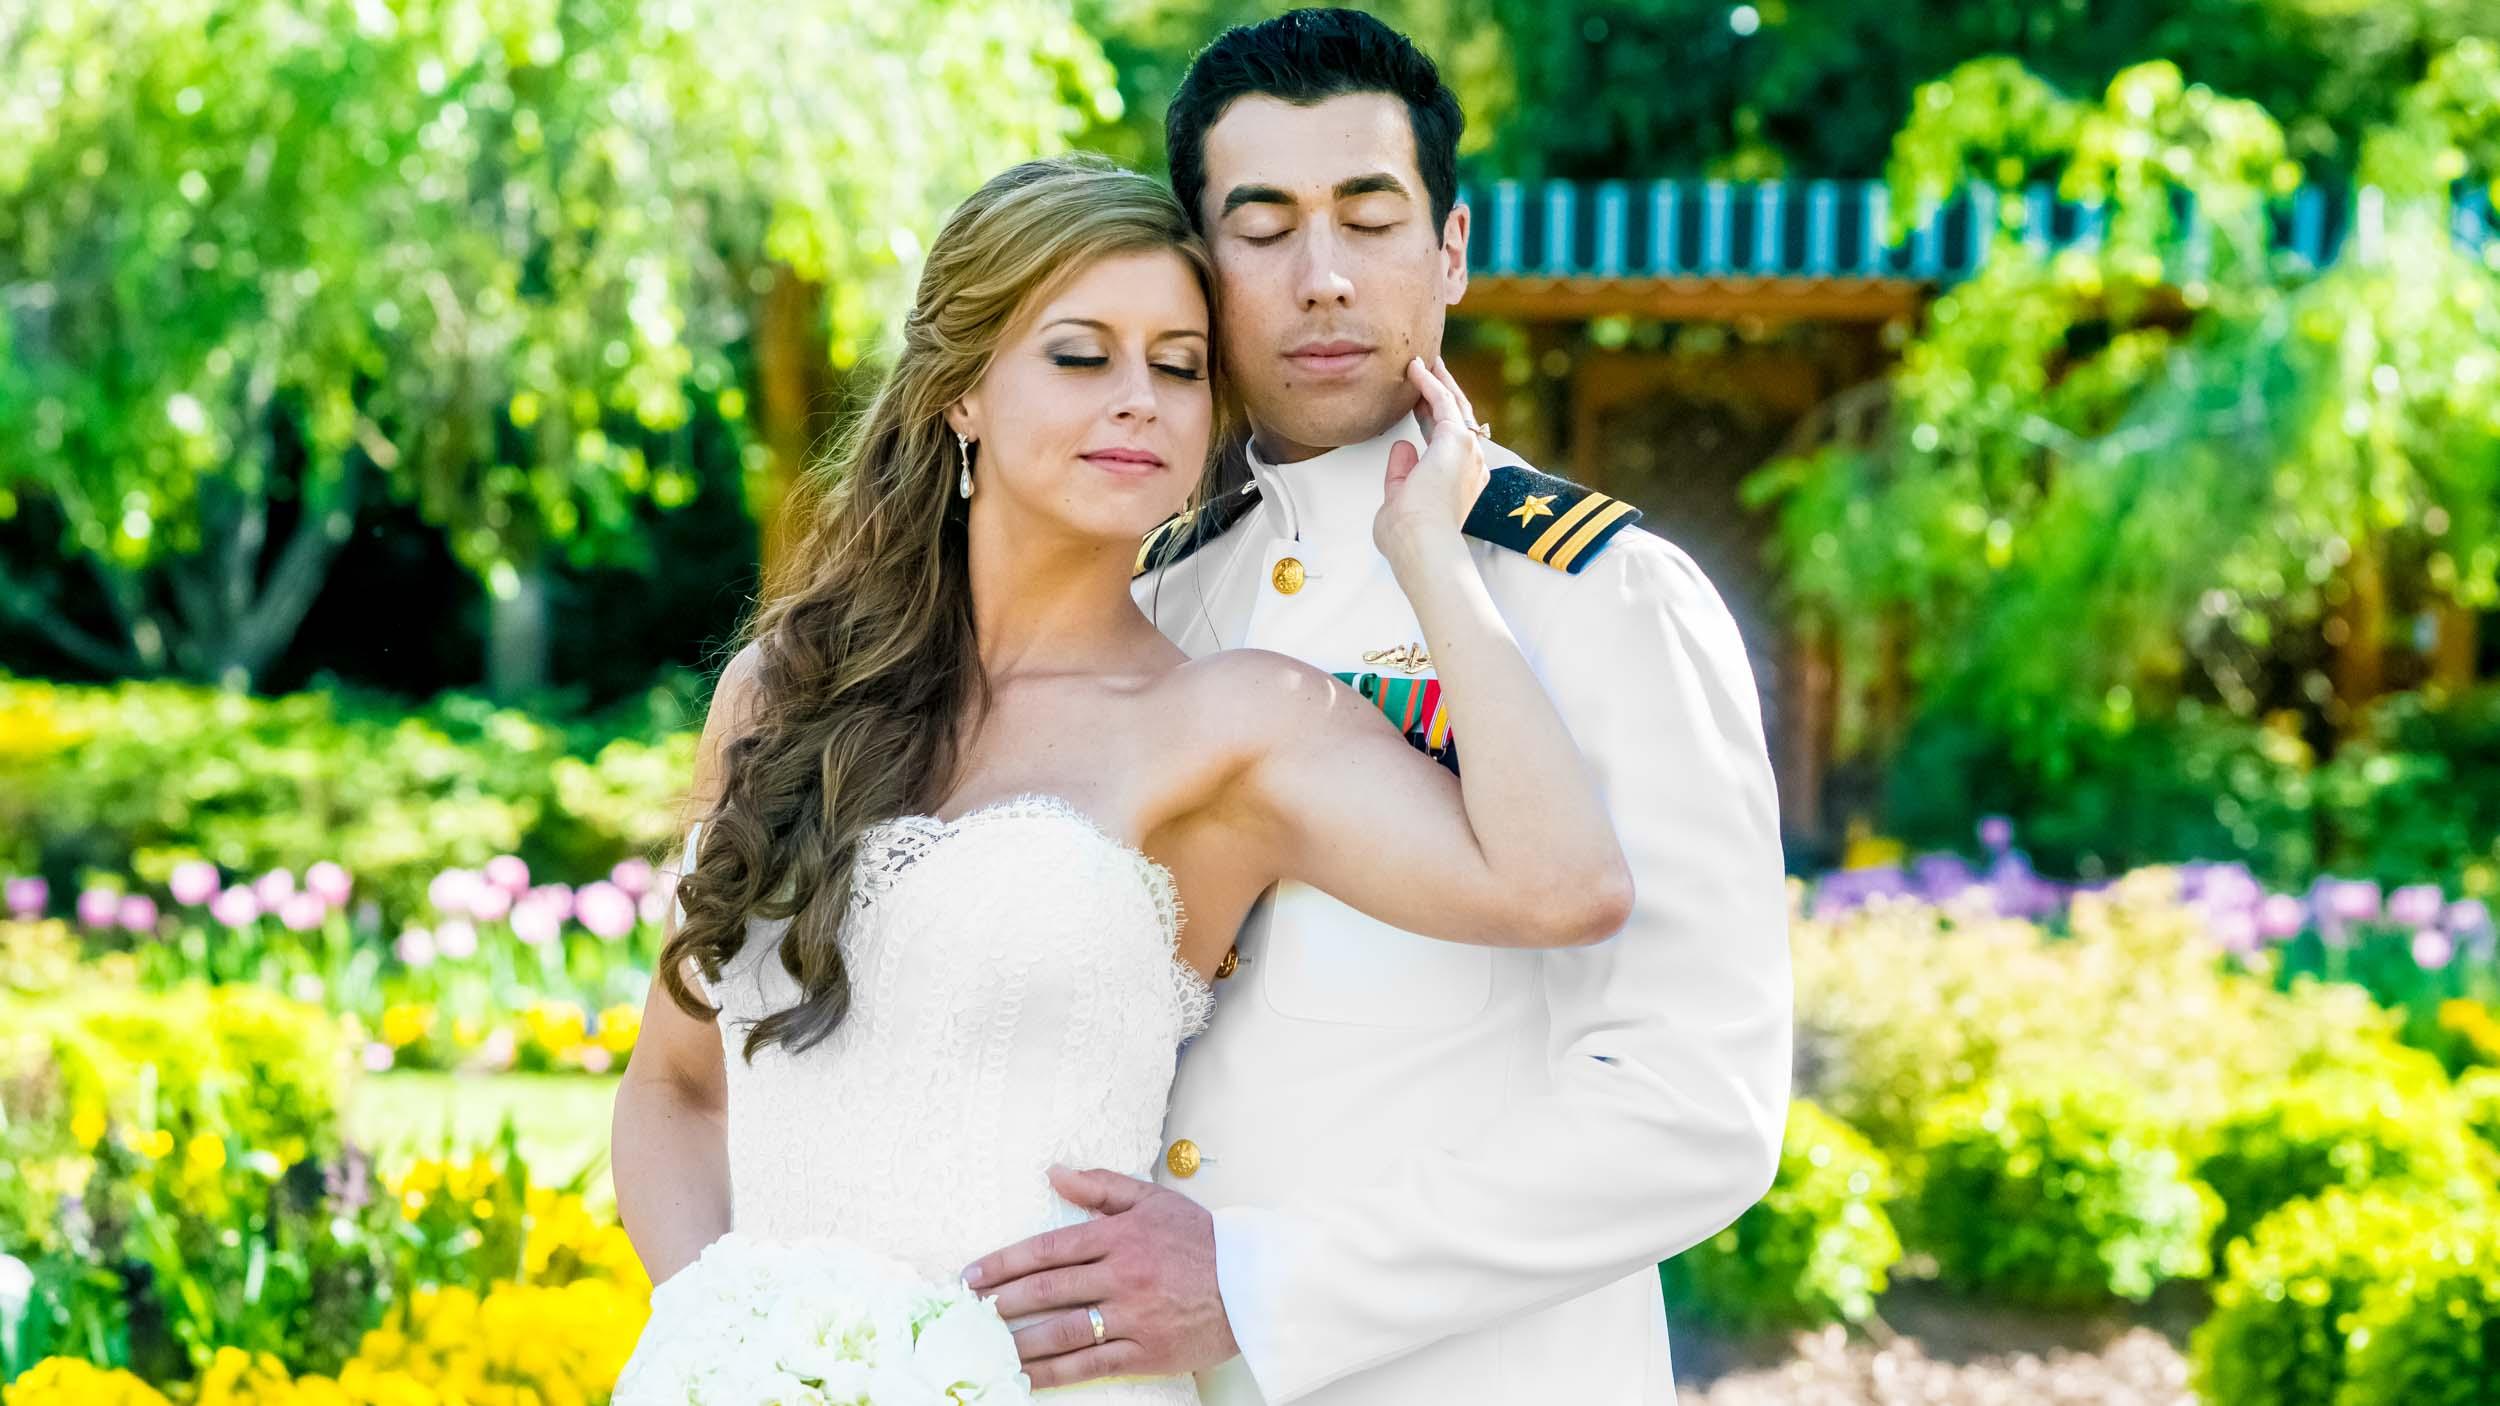 dc+metro+wedding+photographer+vadym+guliuk+photography+wedding+bride+and+groom-2037.jpg